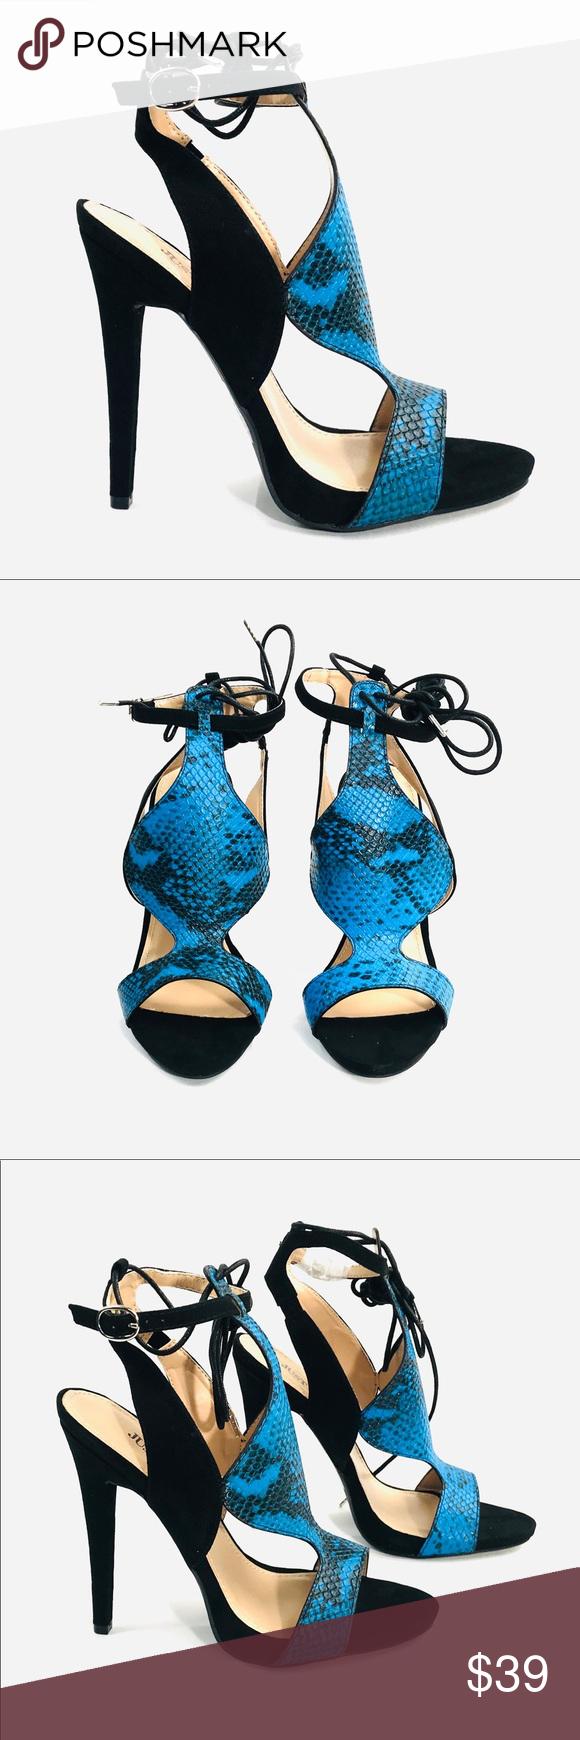 d37afb50300 Blue Snake Print Strappy Heels Blue Snake Print Strappy Heels Buckles at  the ankle and ties